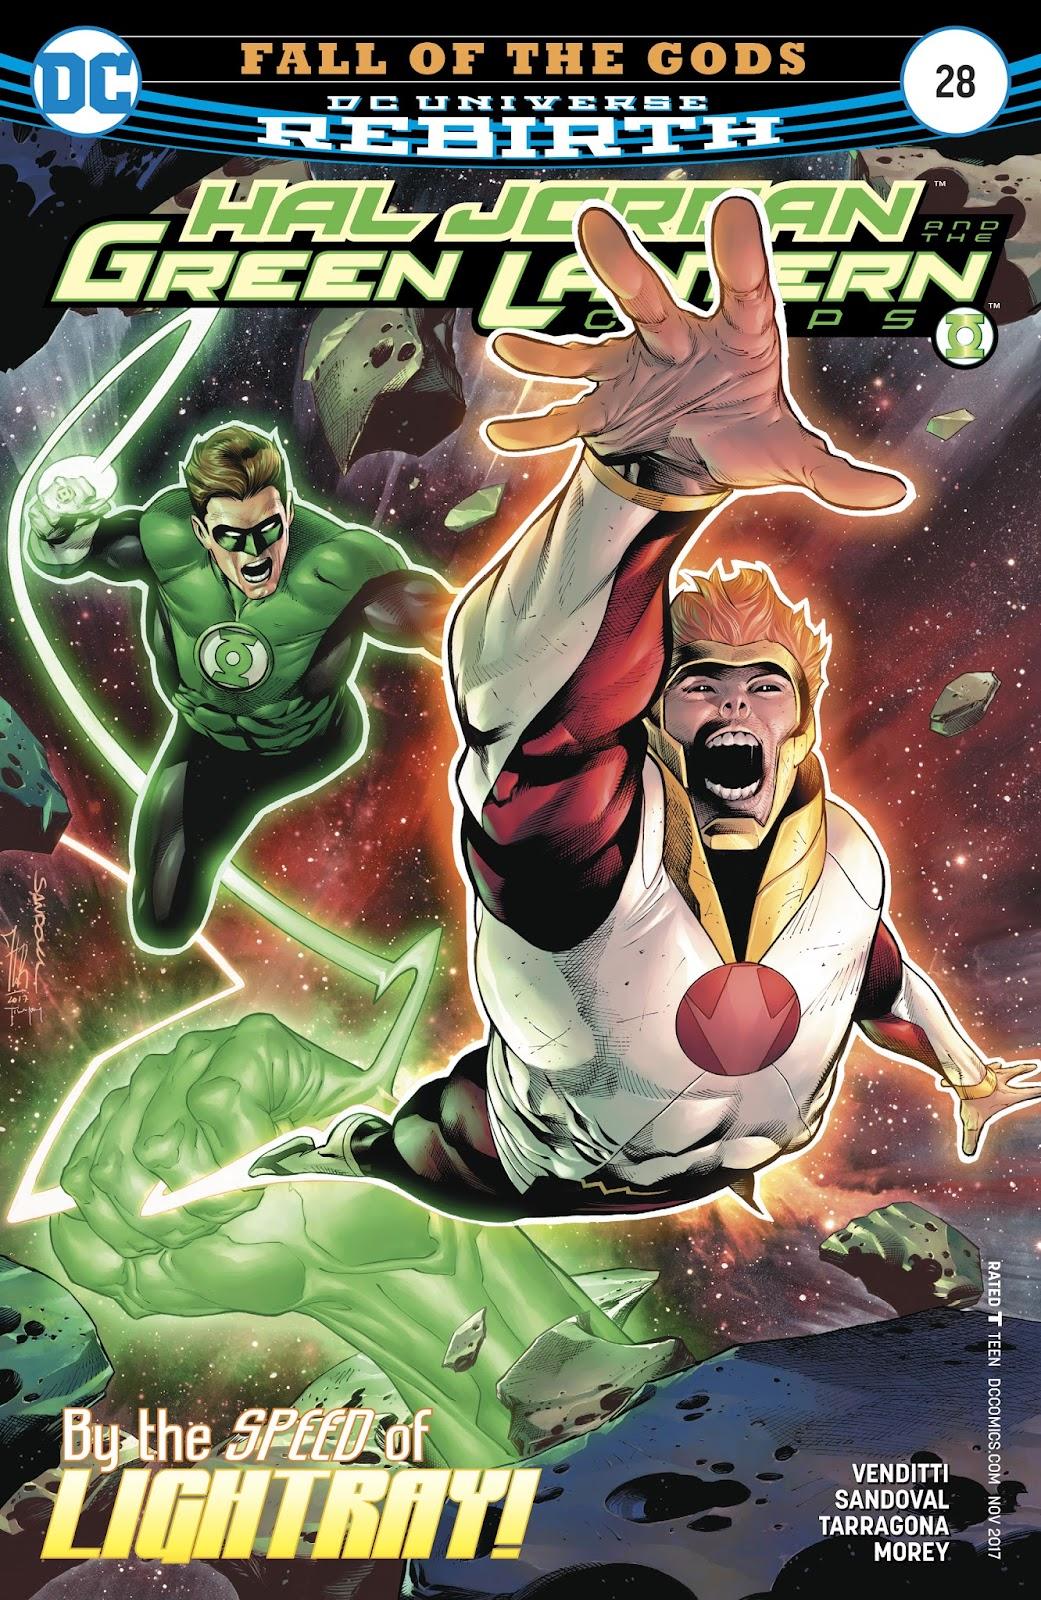 Hal Jordan & the Green Lantern Corps: Rebirth issue 28 - Page 1